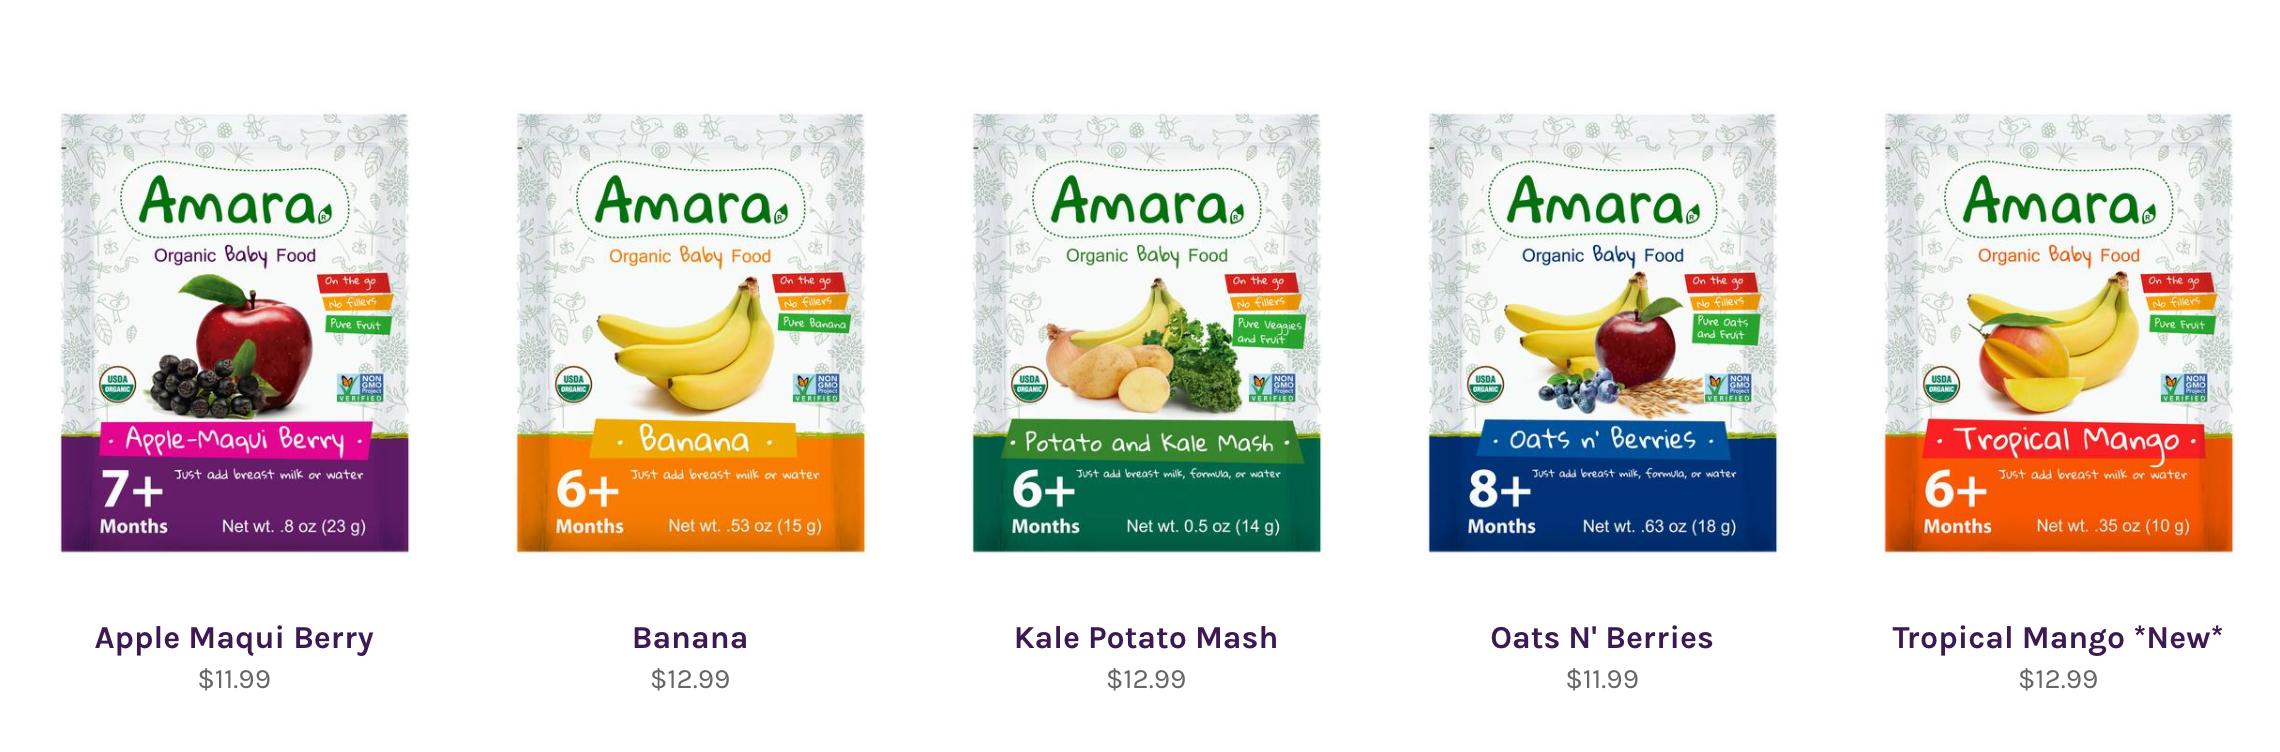 Amara Baby Foods